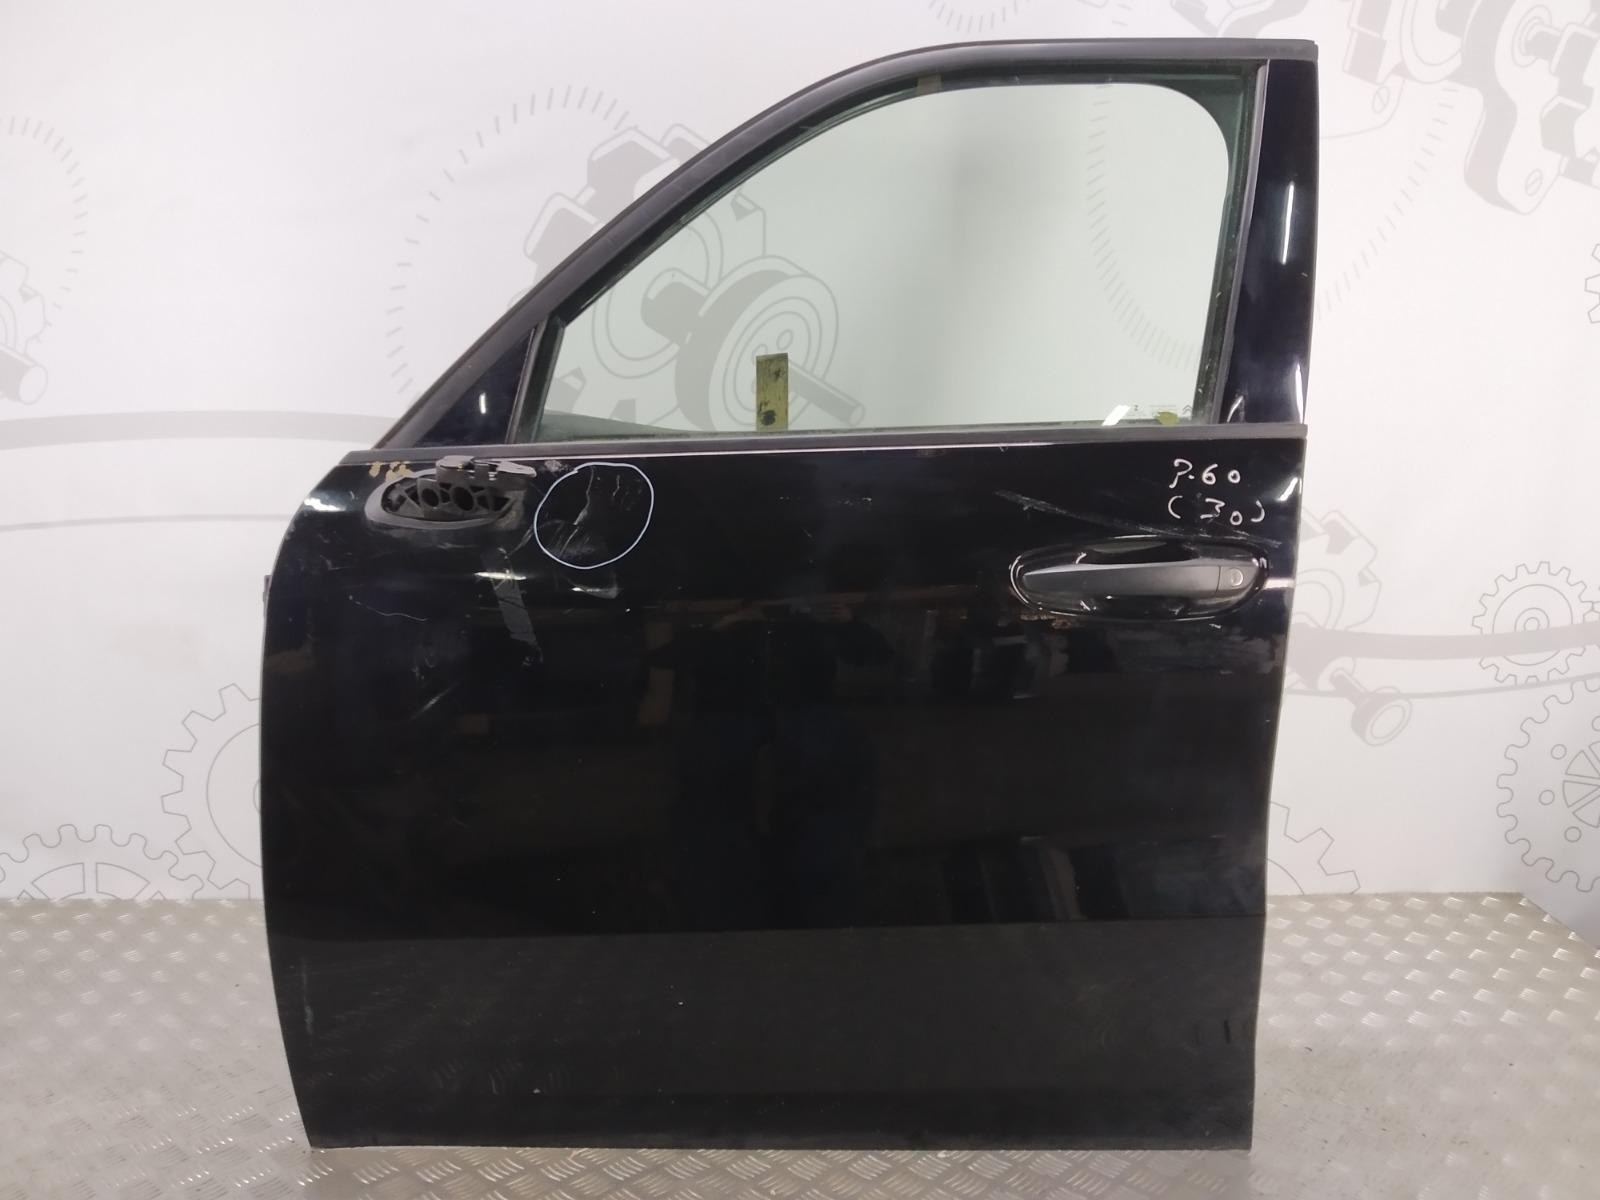 Дверь передняя левая Citroen C4 Grand Picasso 1.6 HDI 2014 (б/у)